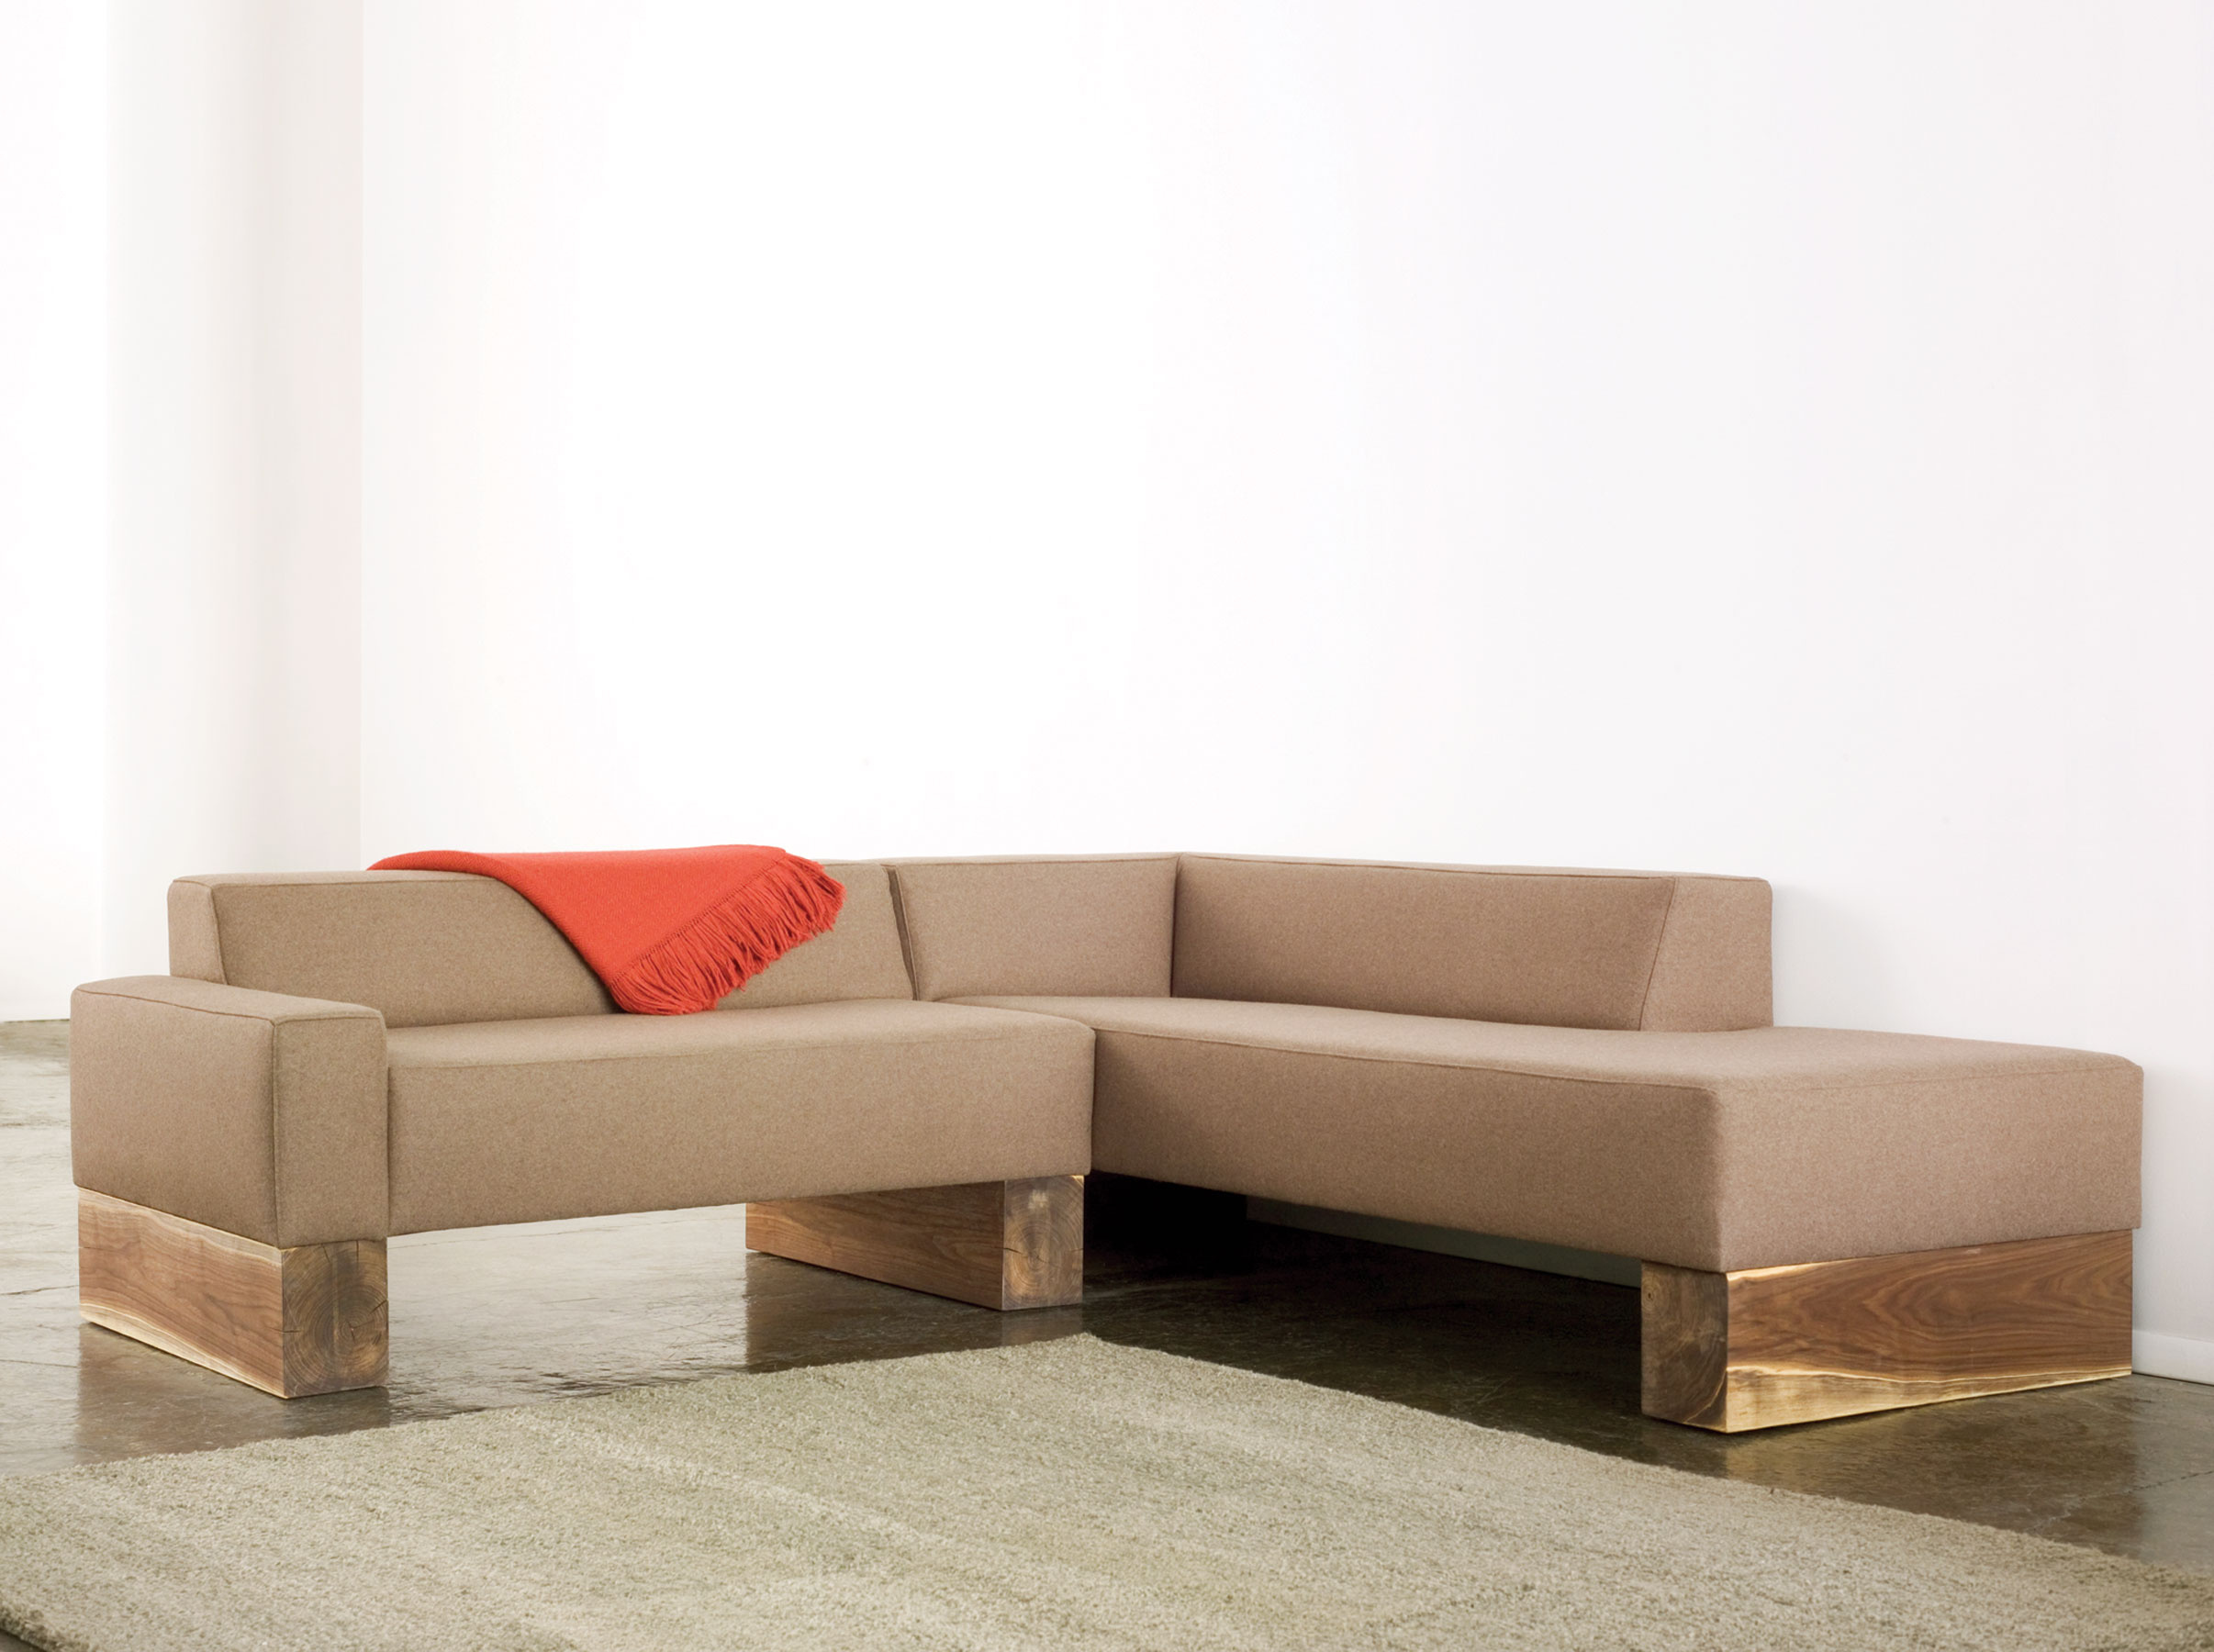 Beam Sectional Sofa